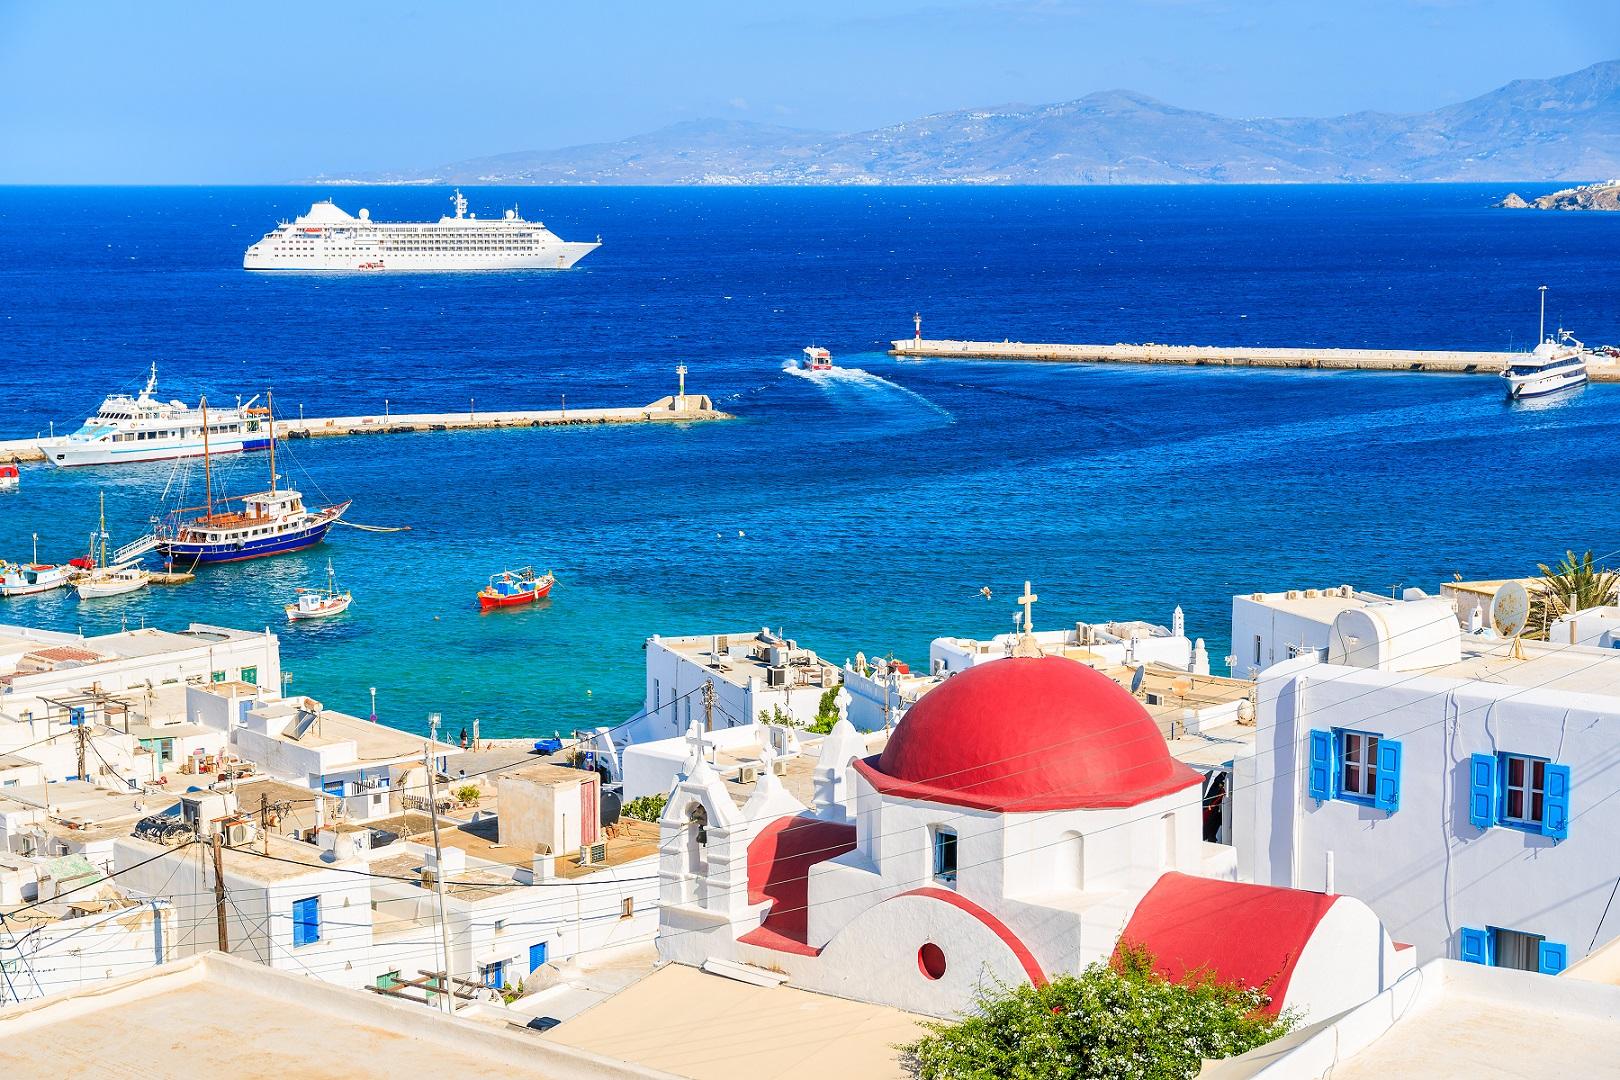 Greece-Cyclades-Islands-Mykonos-Port-Marina